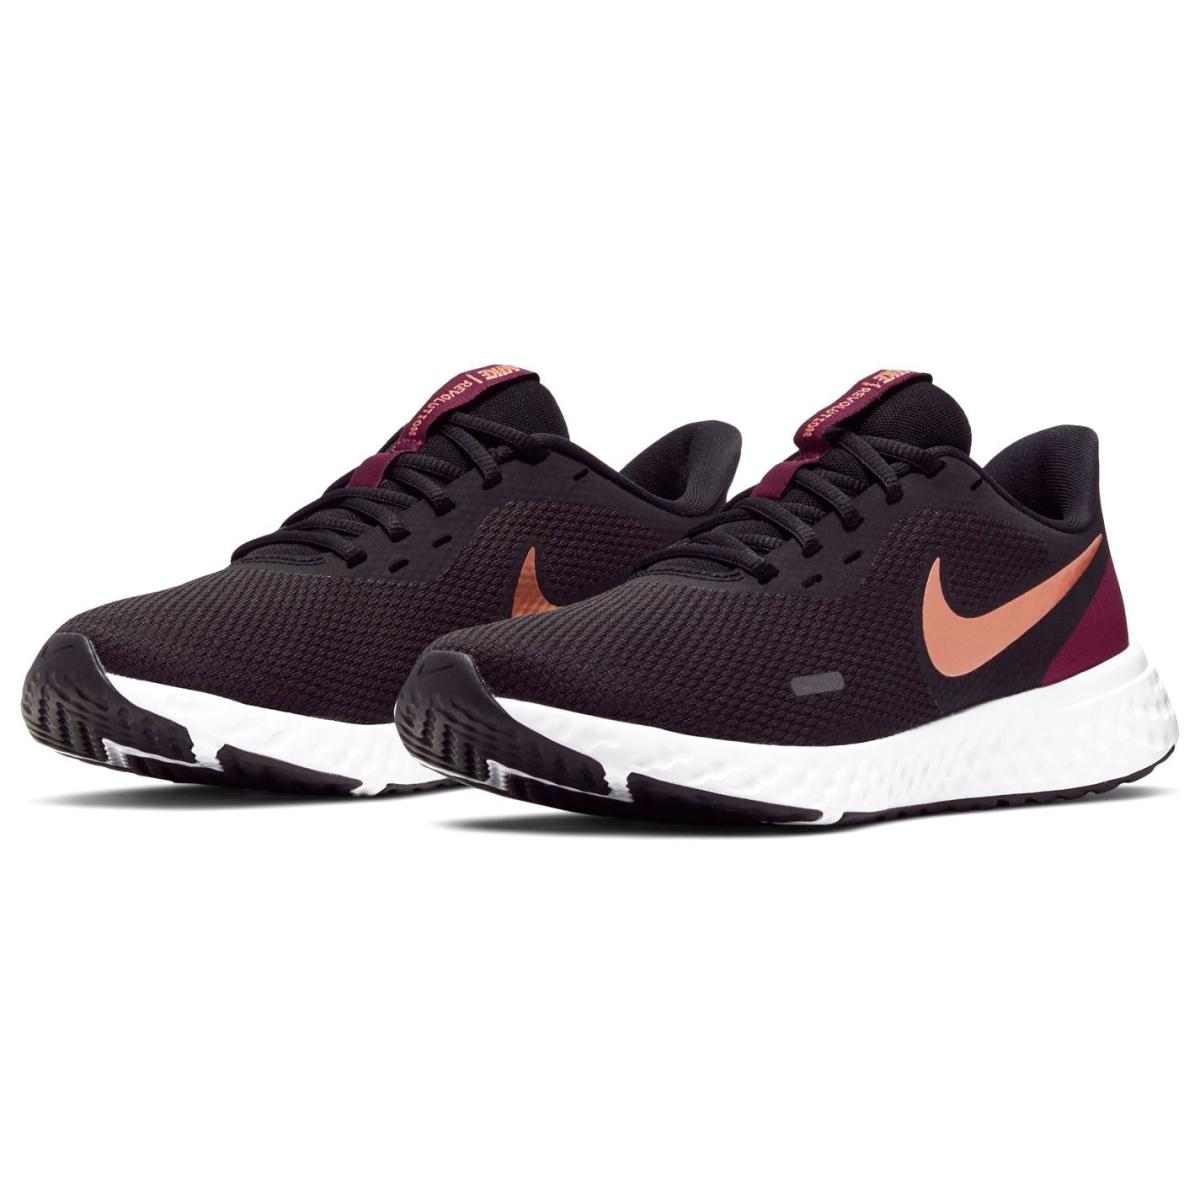 Nike Revolution Turnschuhe Damen Sneaker Sportschuhe Laufschuhe 1160